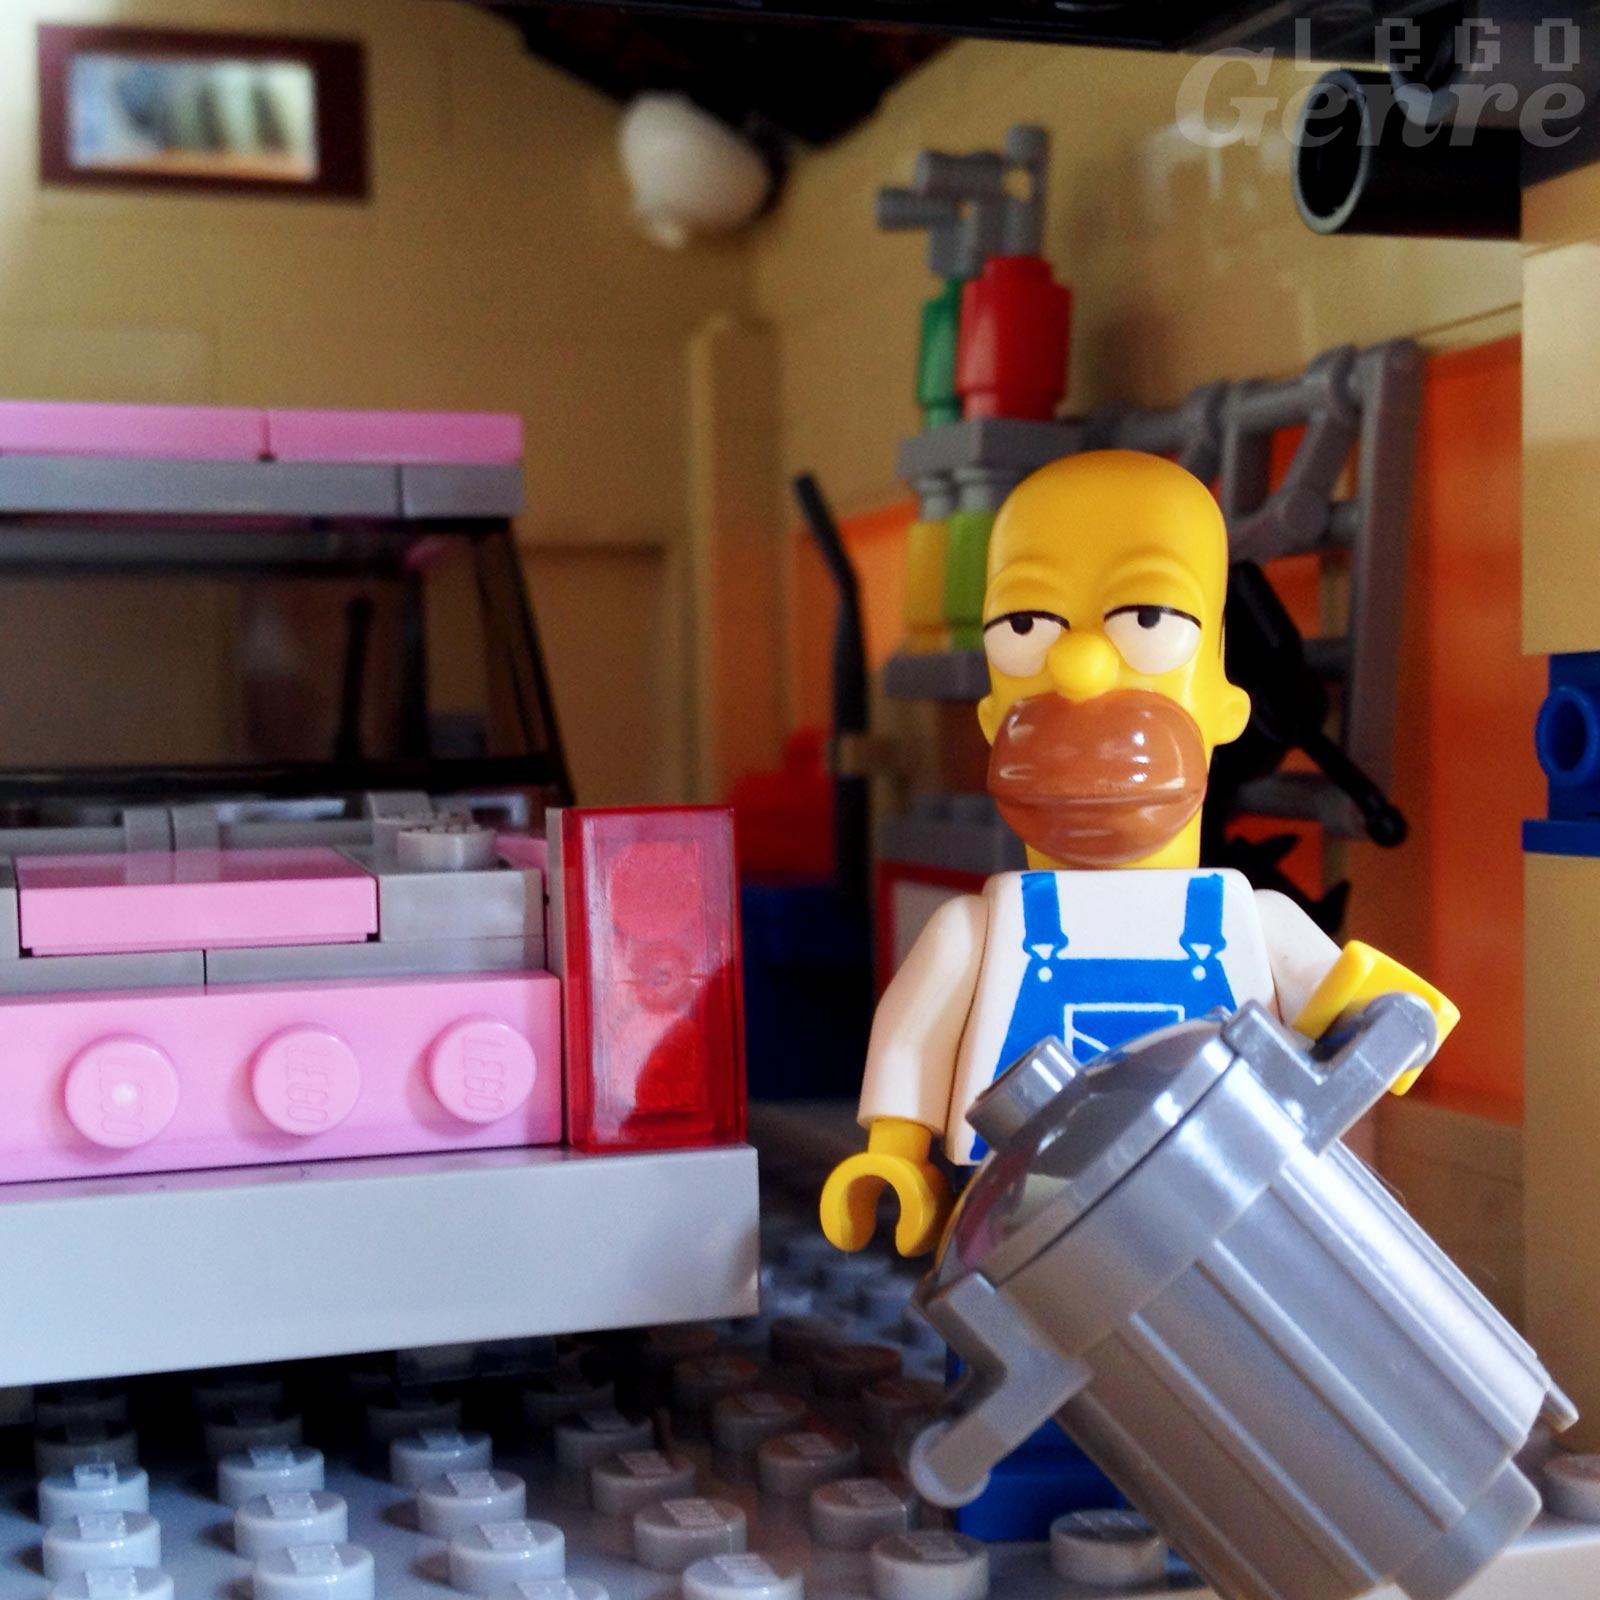 LegoGenre 00366: The Garbage Man Can